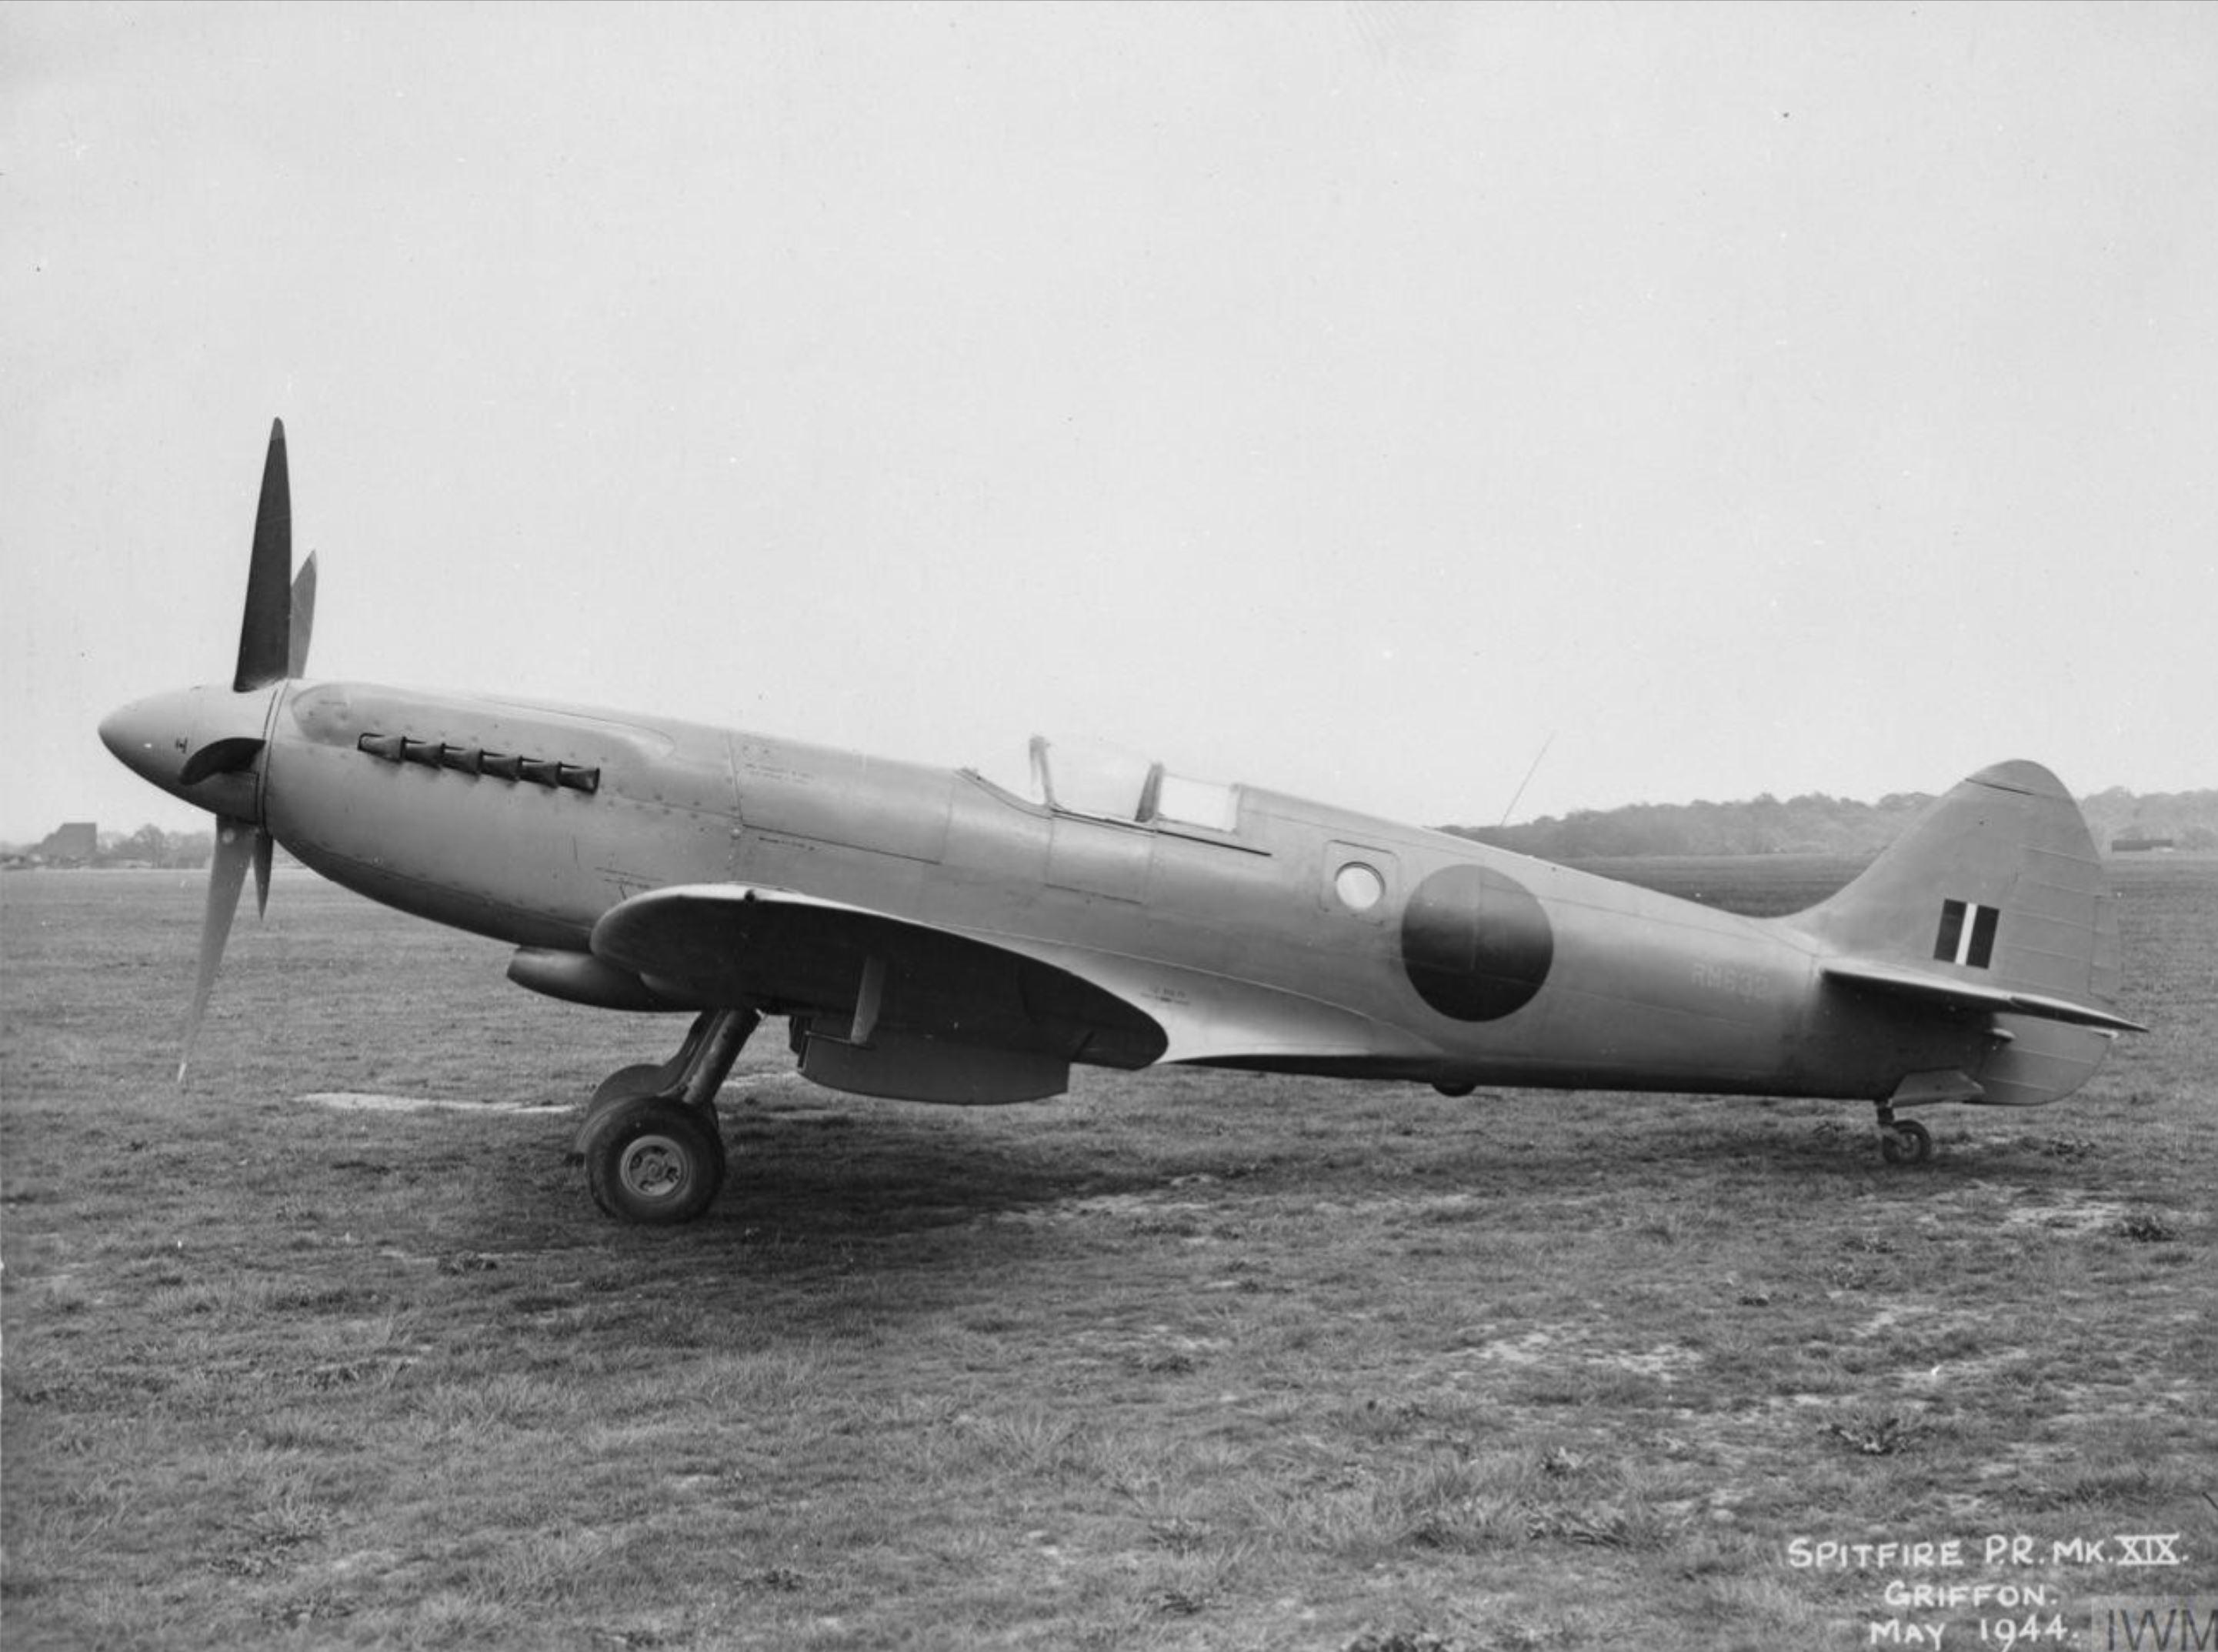 Spitfire PR19 Prototype RM632 factory fresh England May 1944 IWM MH5280